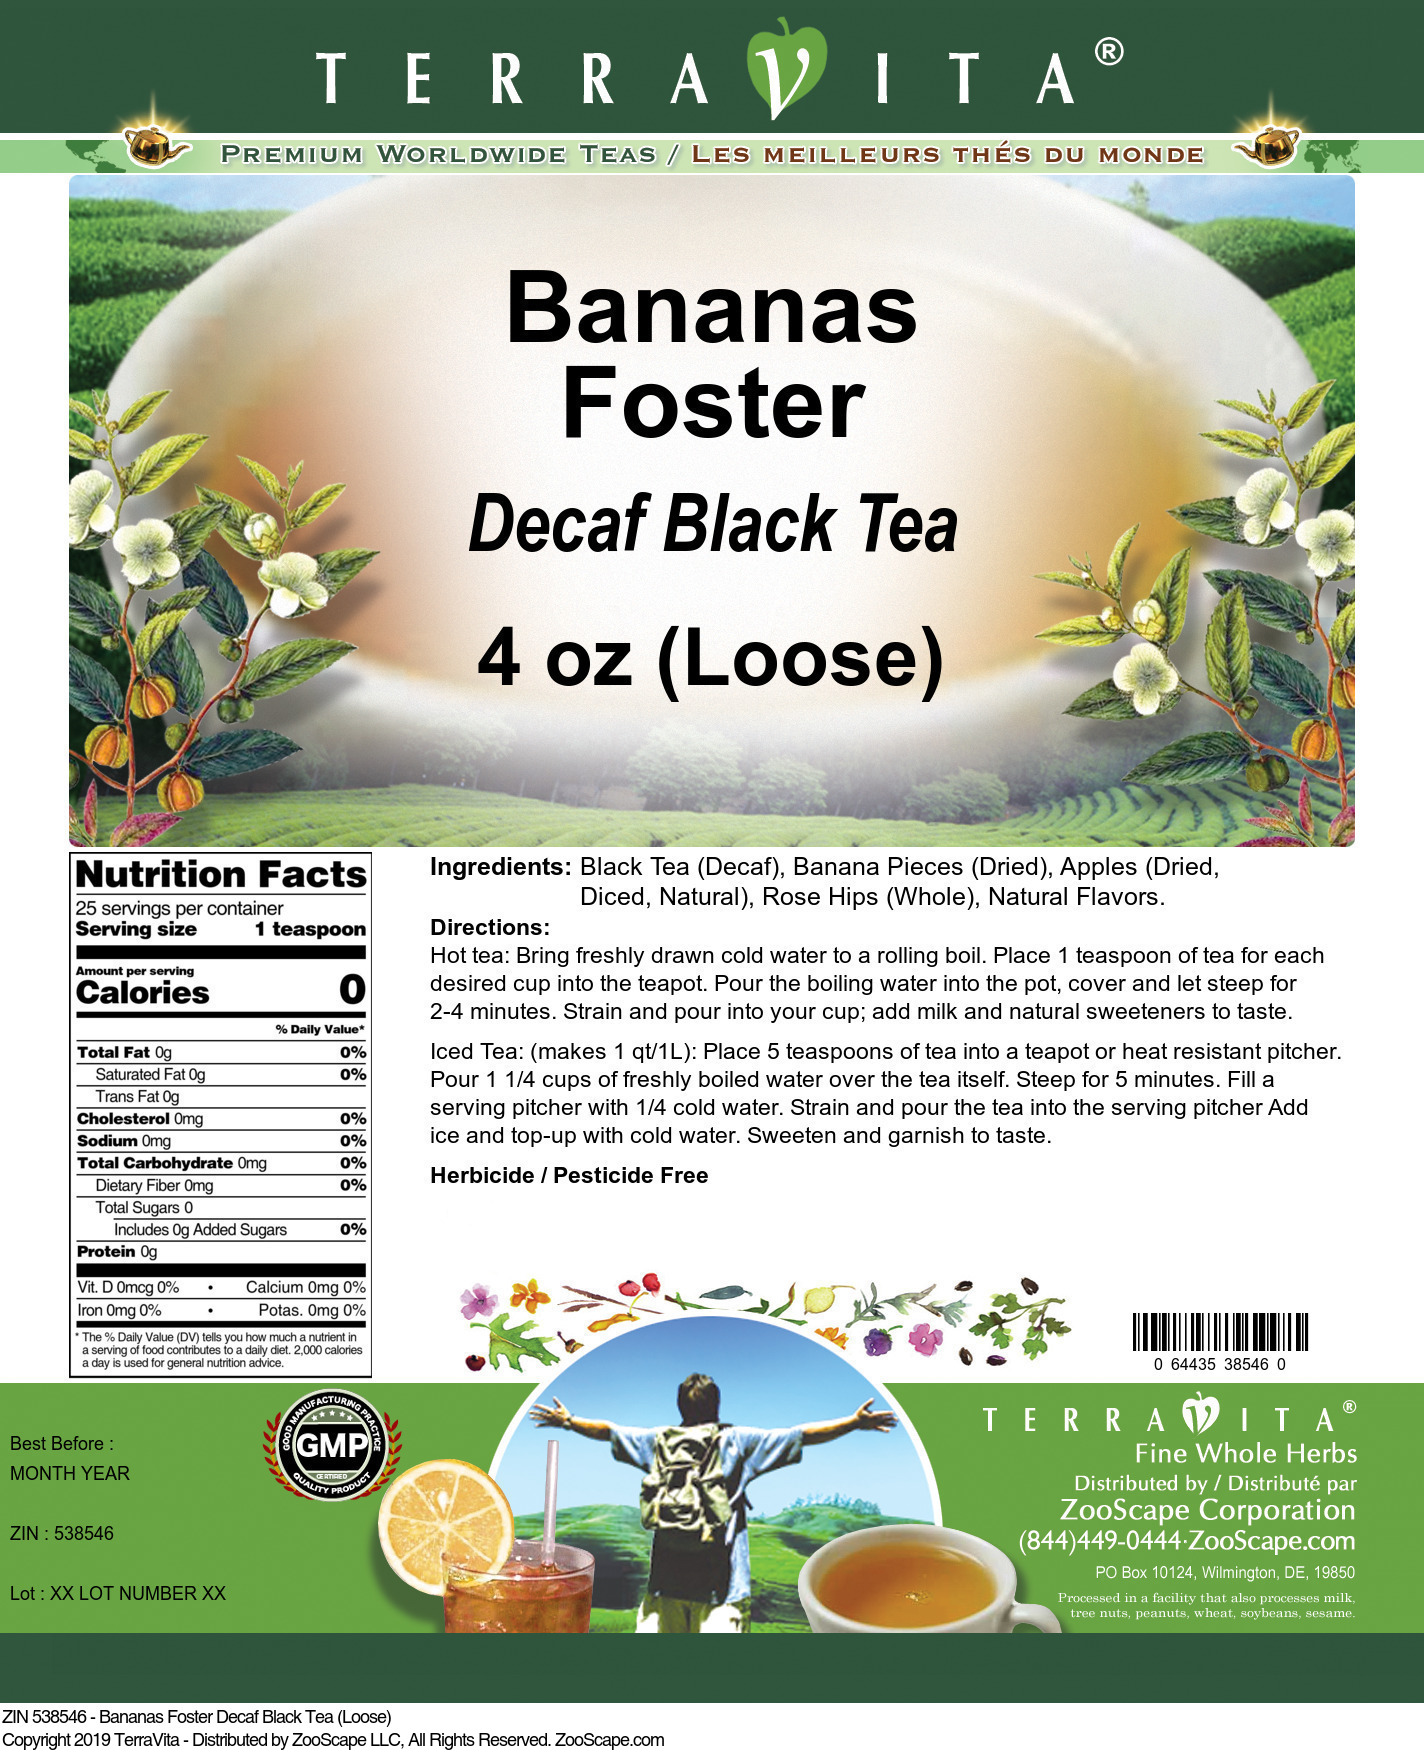 Bananas Foster Decaf Black Tea (Loose)